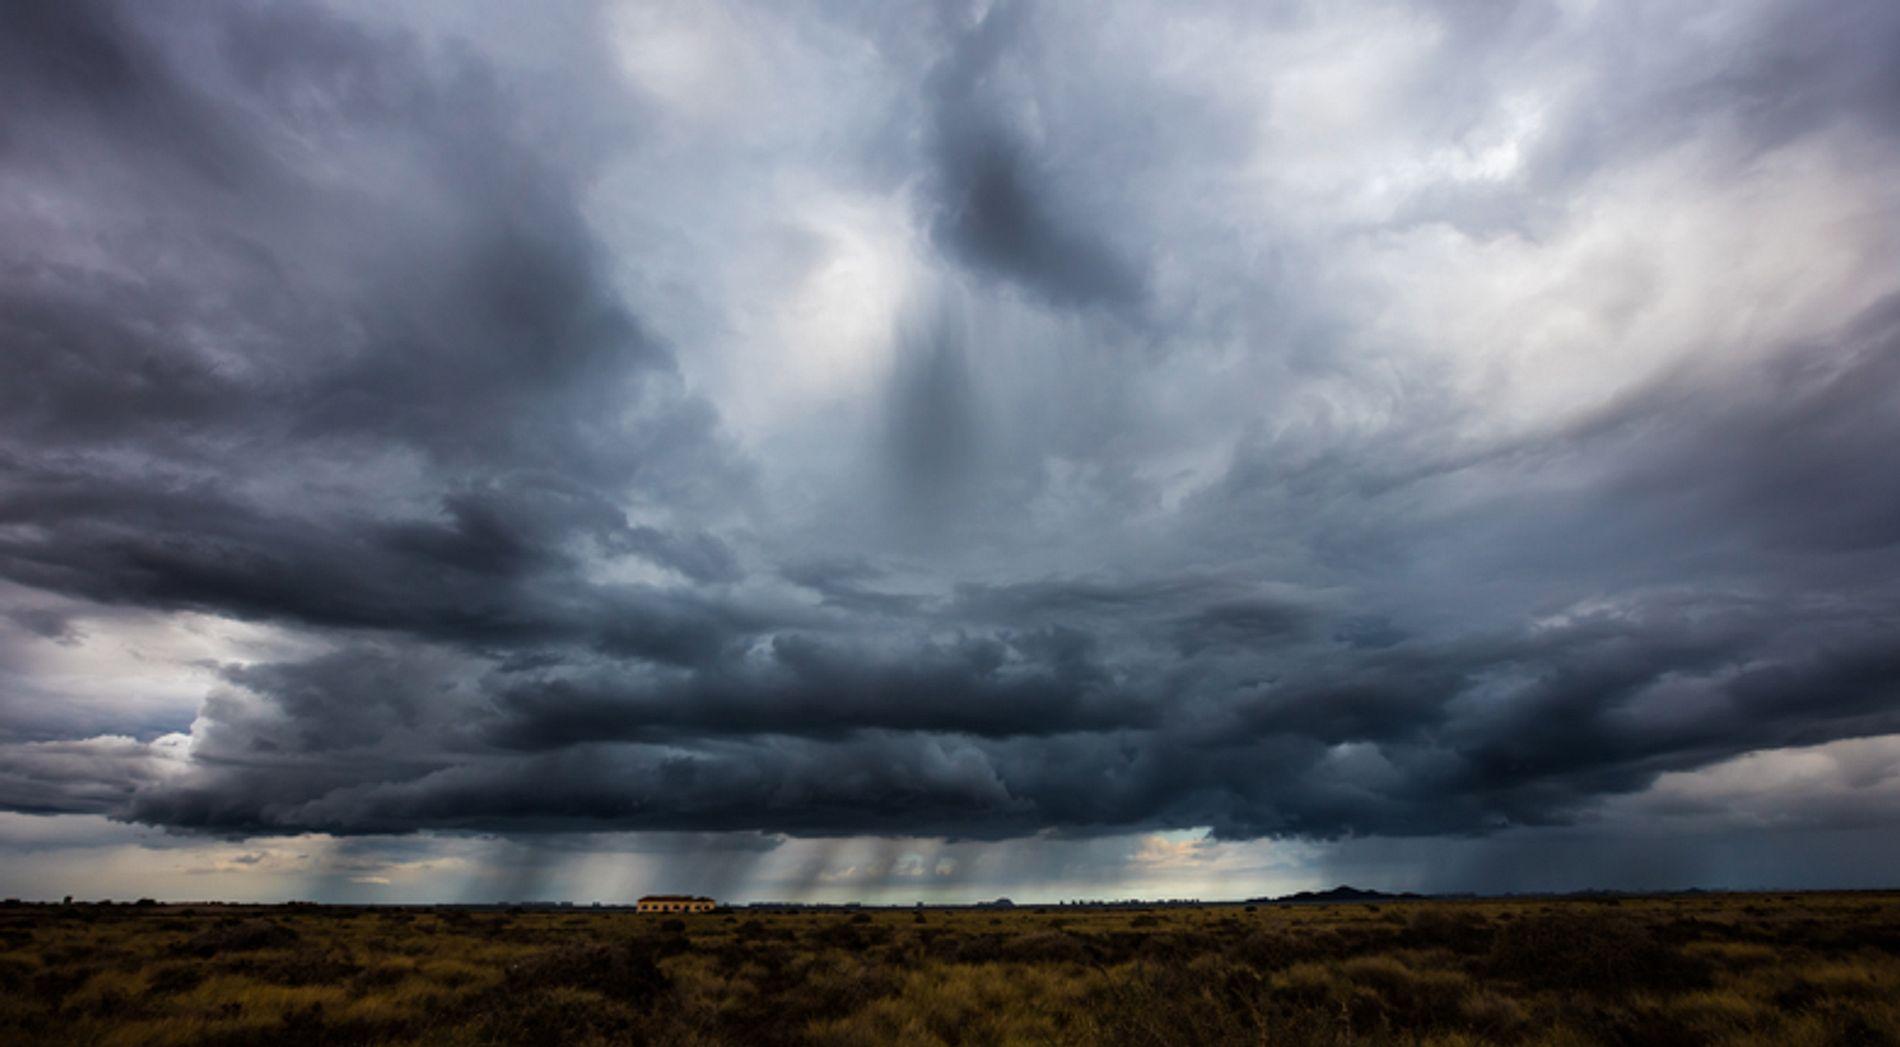 Gloomy sky over field